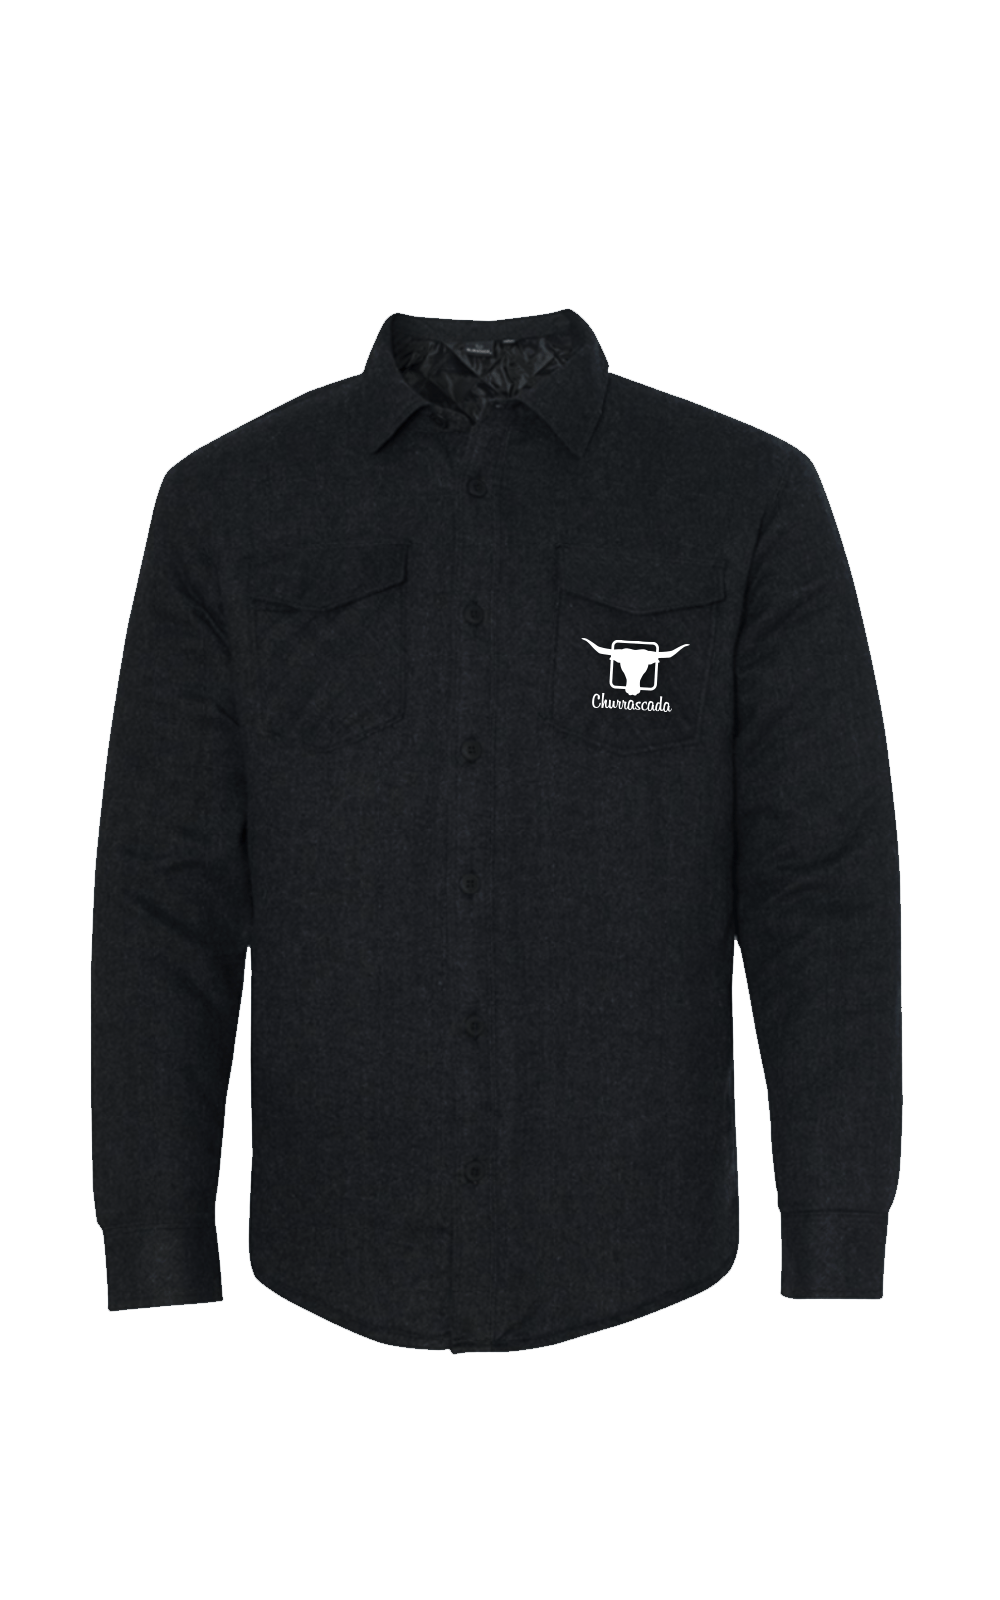 Camisa_8610_Churrascada_LogoWhite_Black_Frente